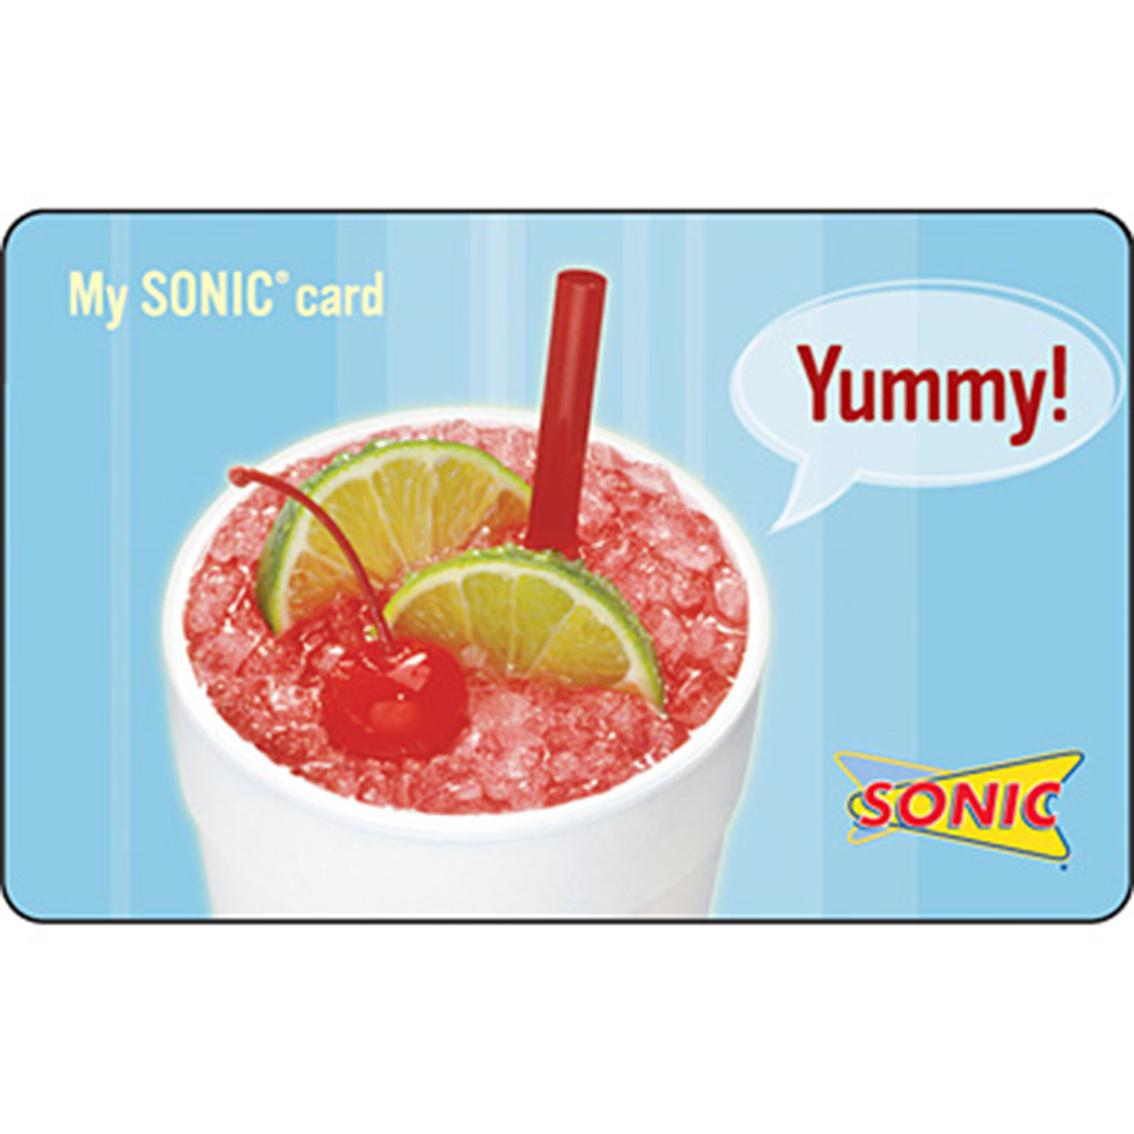 SONIC GIFT CARD